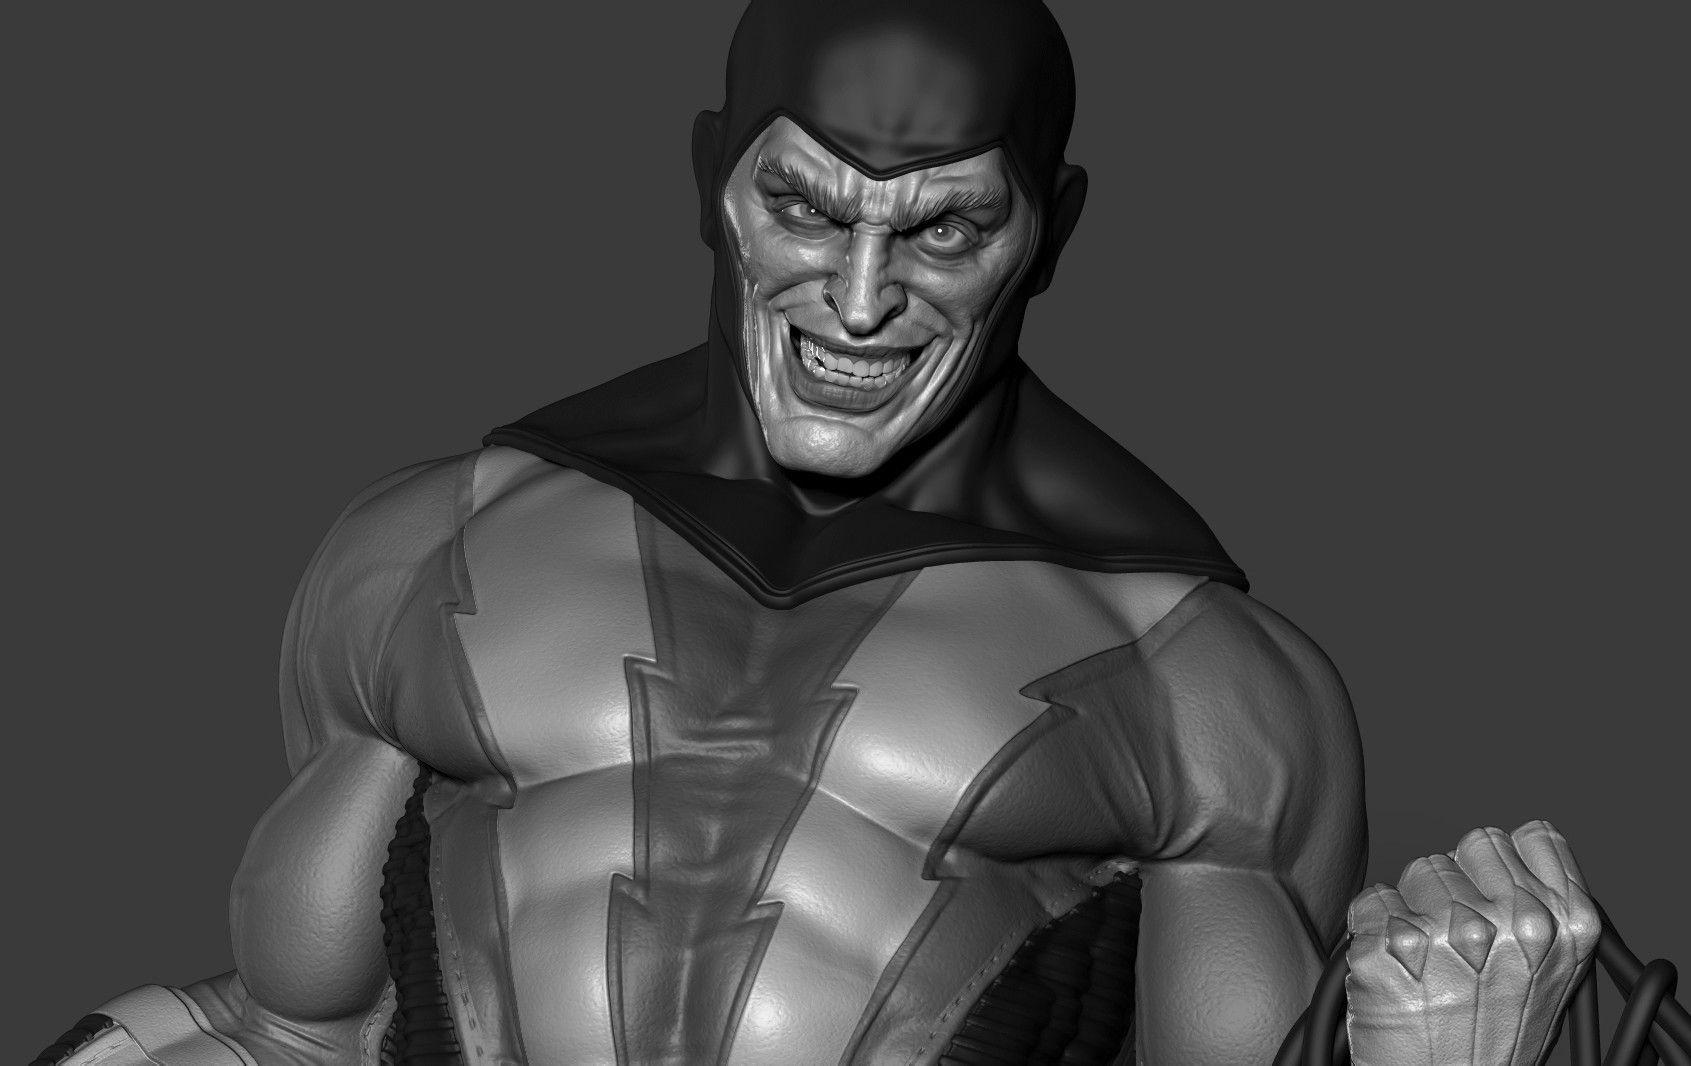 ArtStation - Marvel Electro for XM Studios, Daniel Bel | inspiration ...